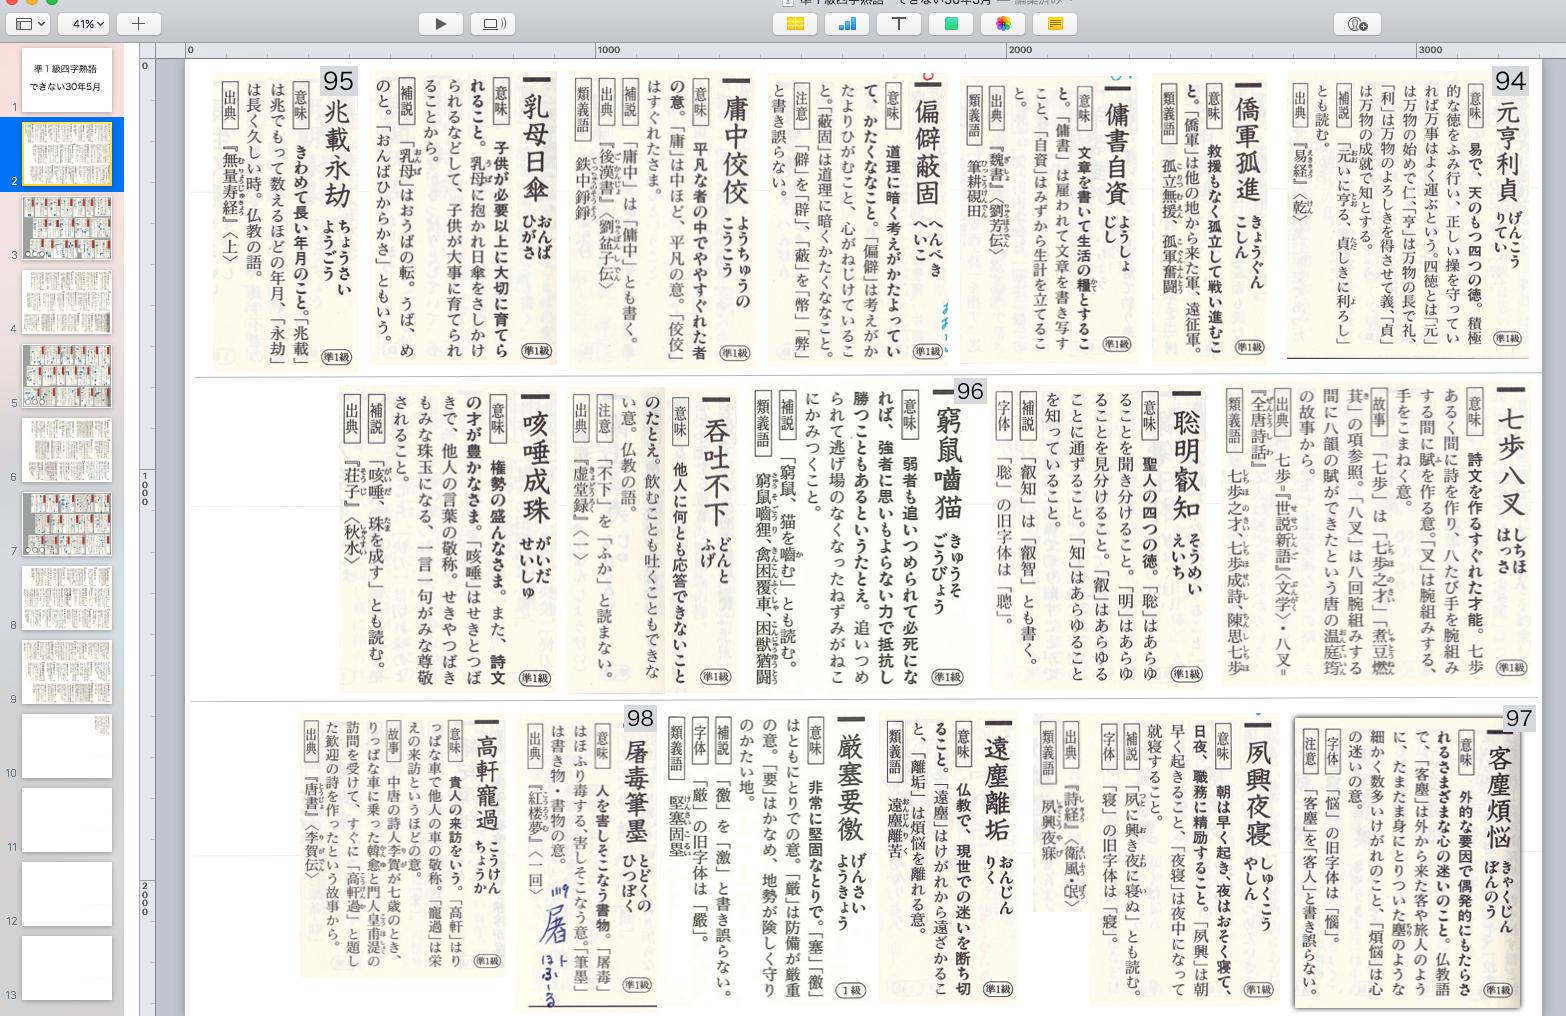 漢 検 三 級 四 字 熟語